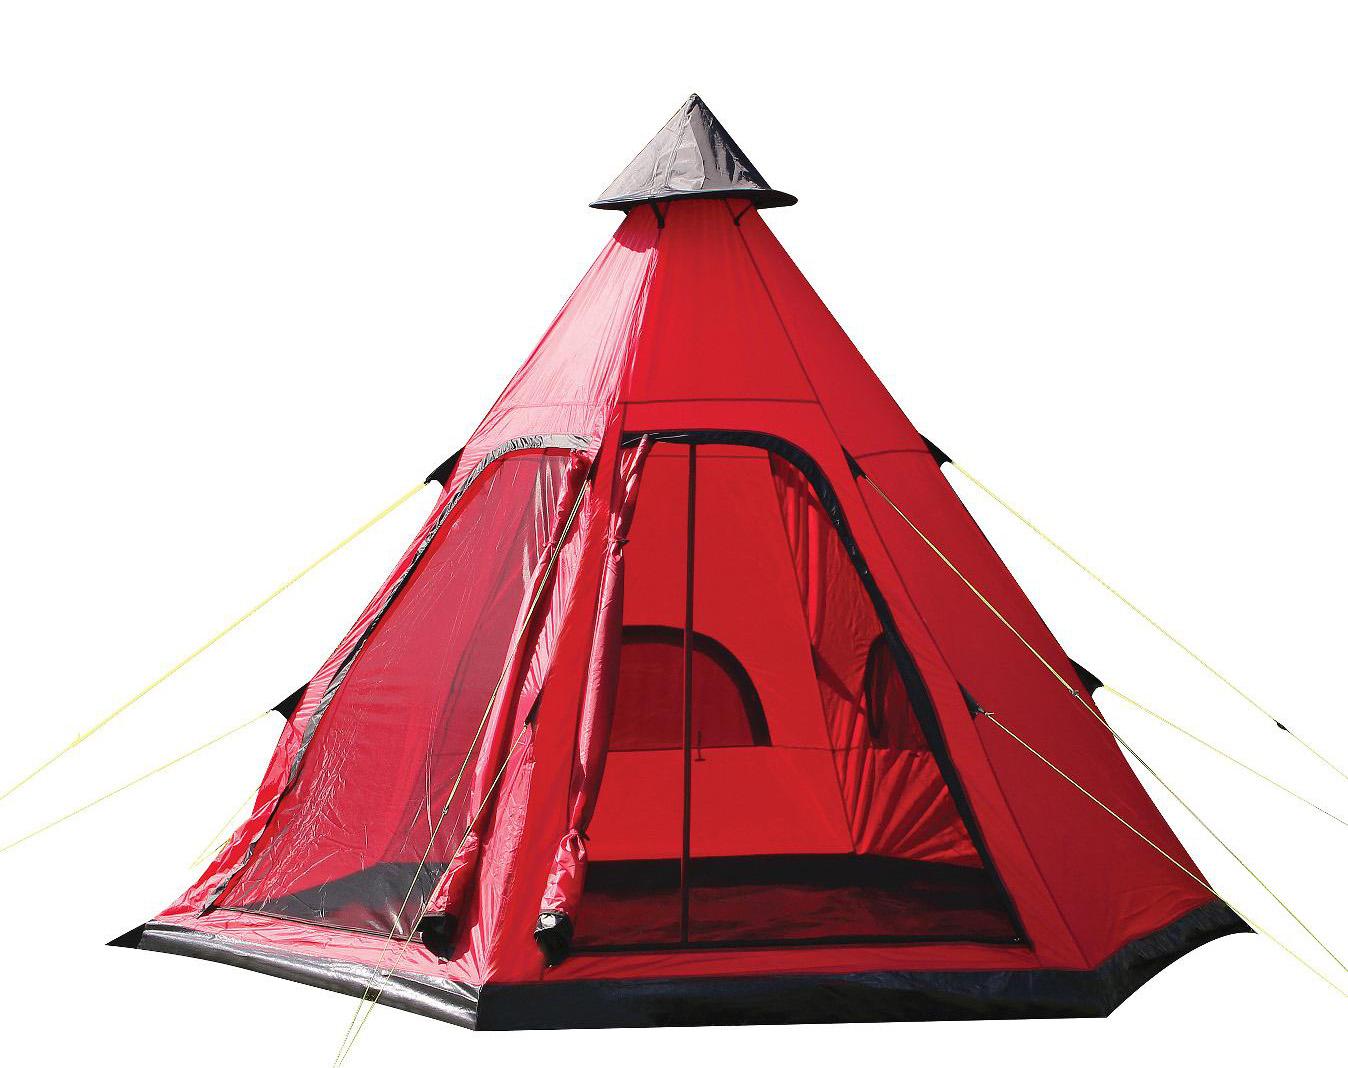 Tipi Festival Tent